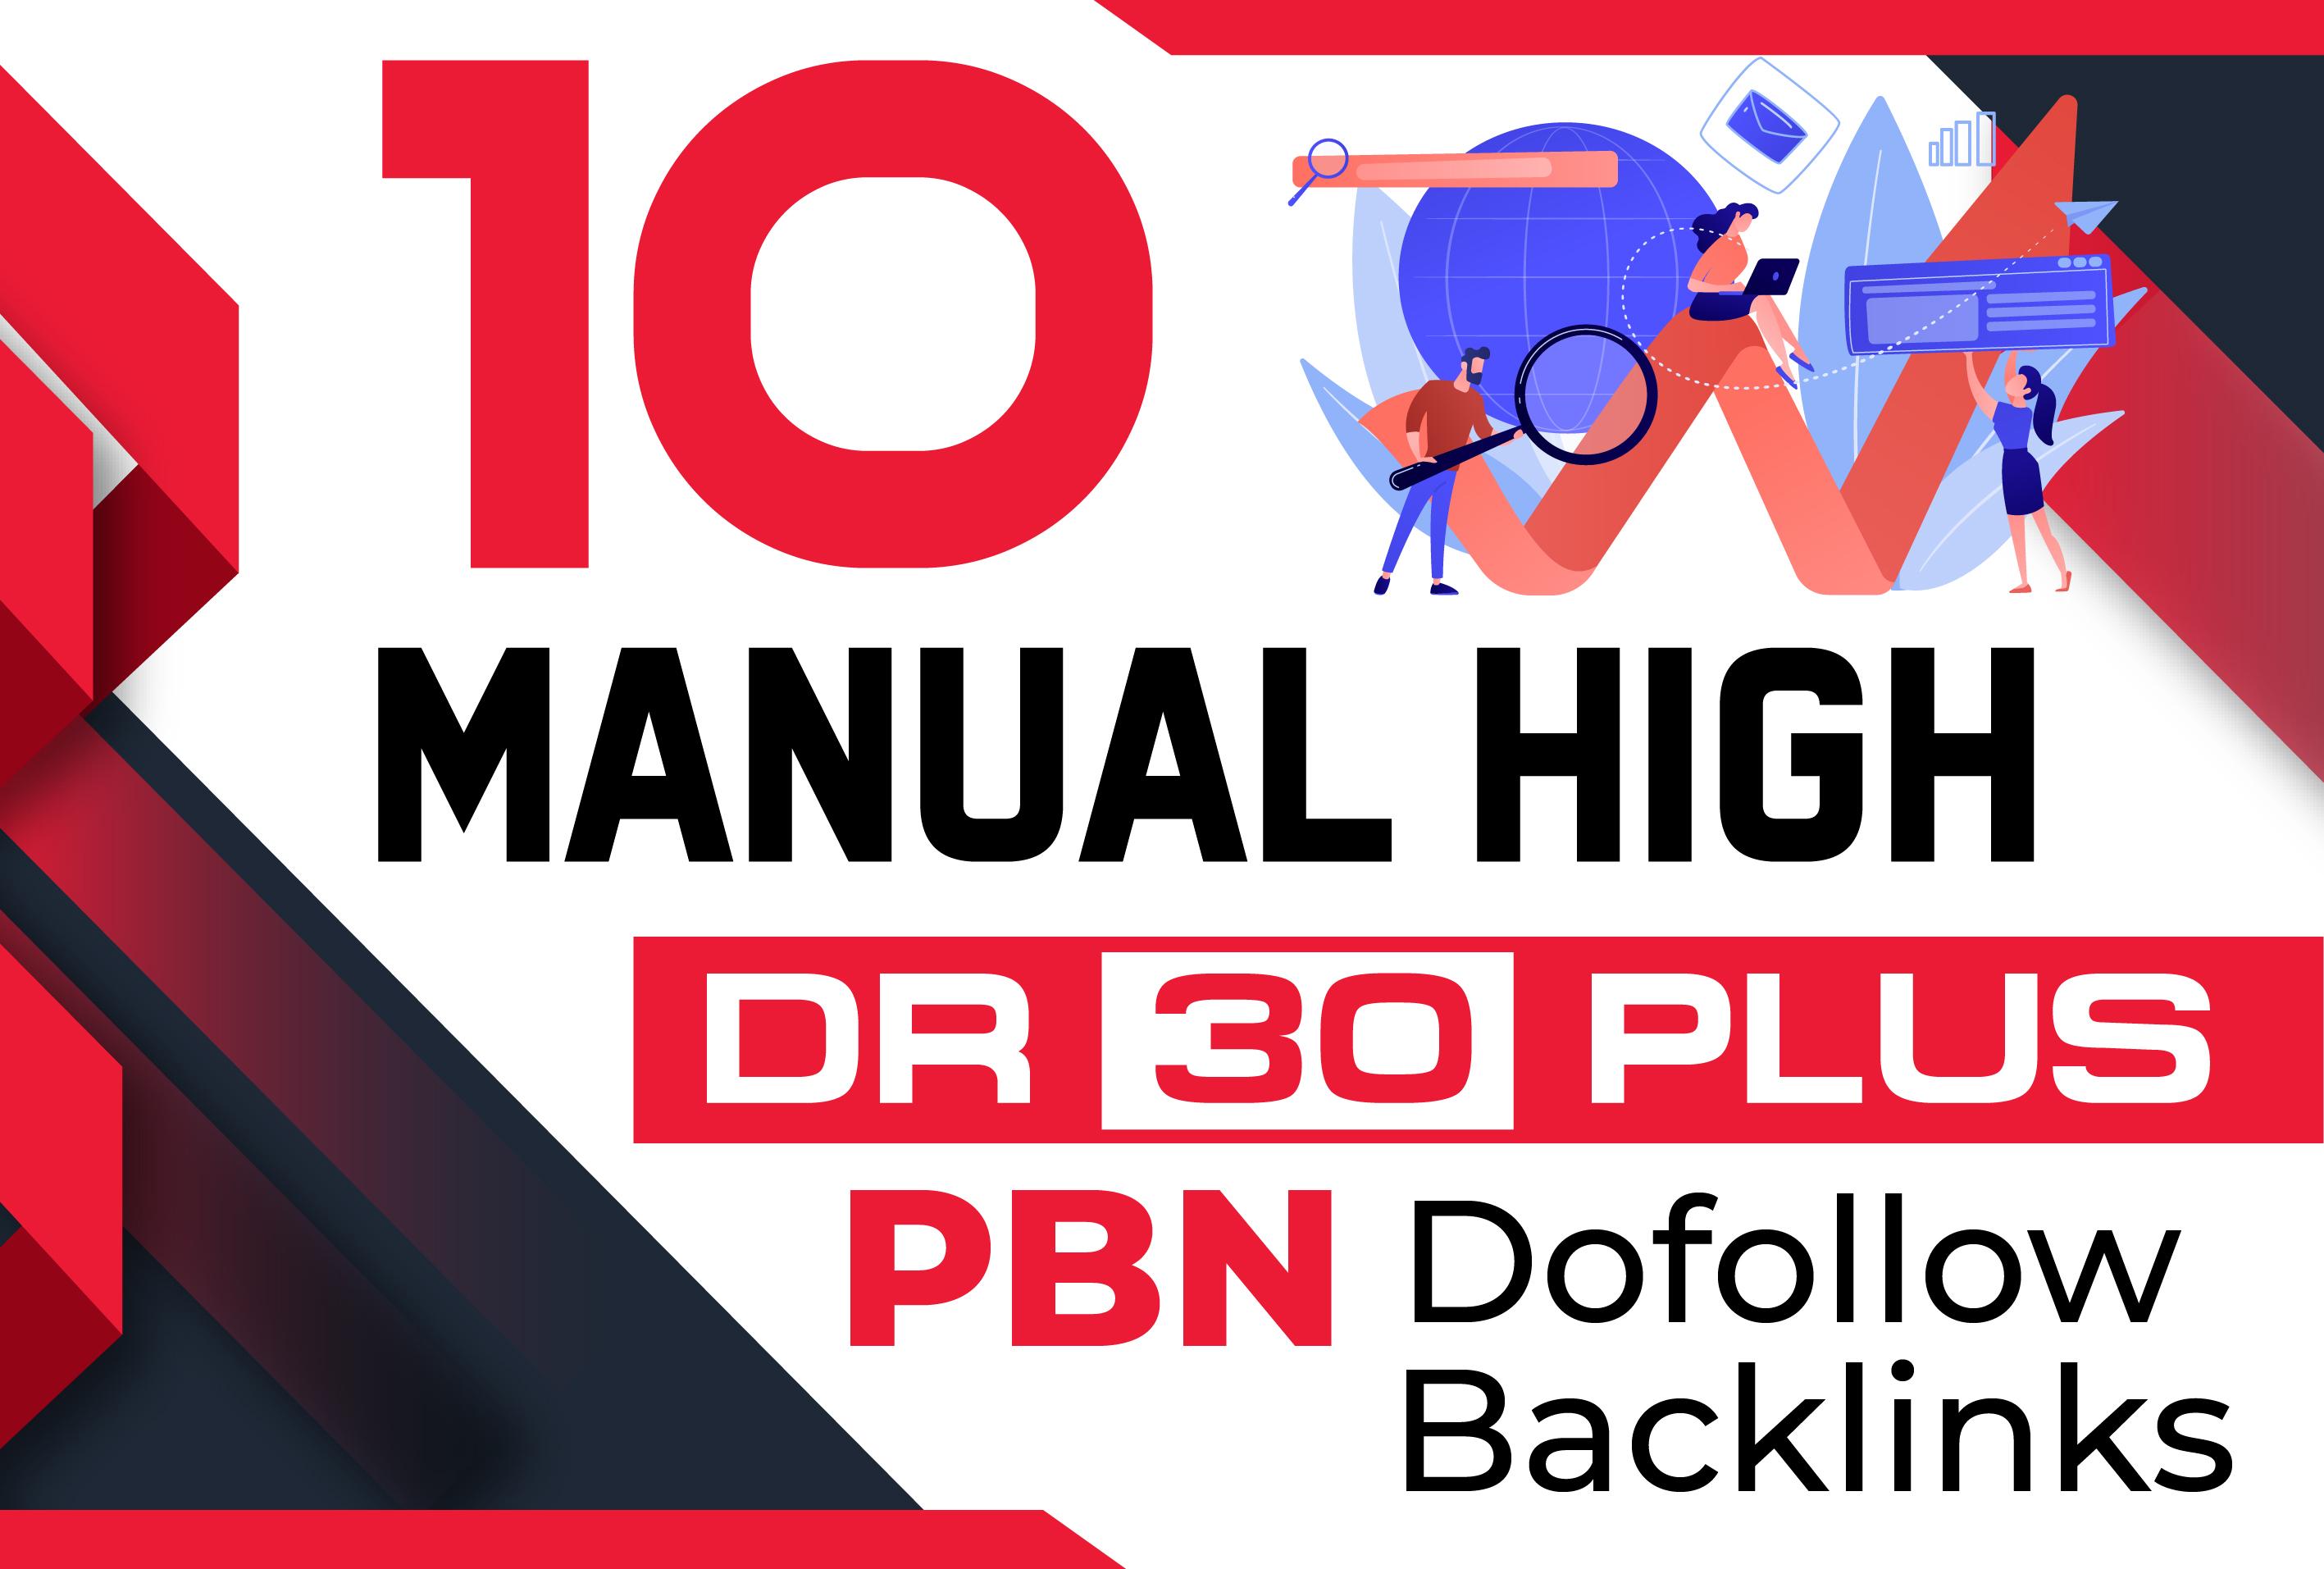 build 10 Manual High DR 30 Plus PBN Dofollow Backlinks